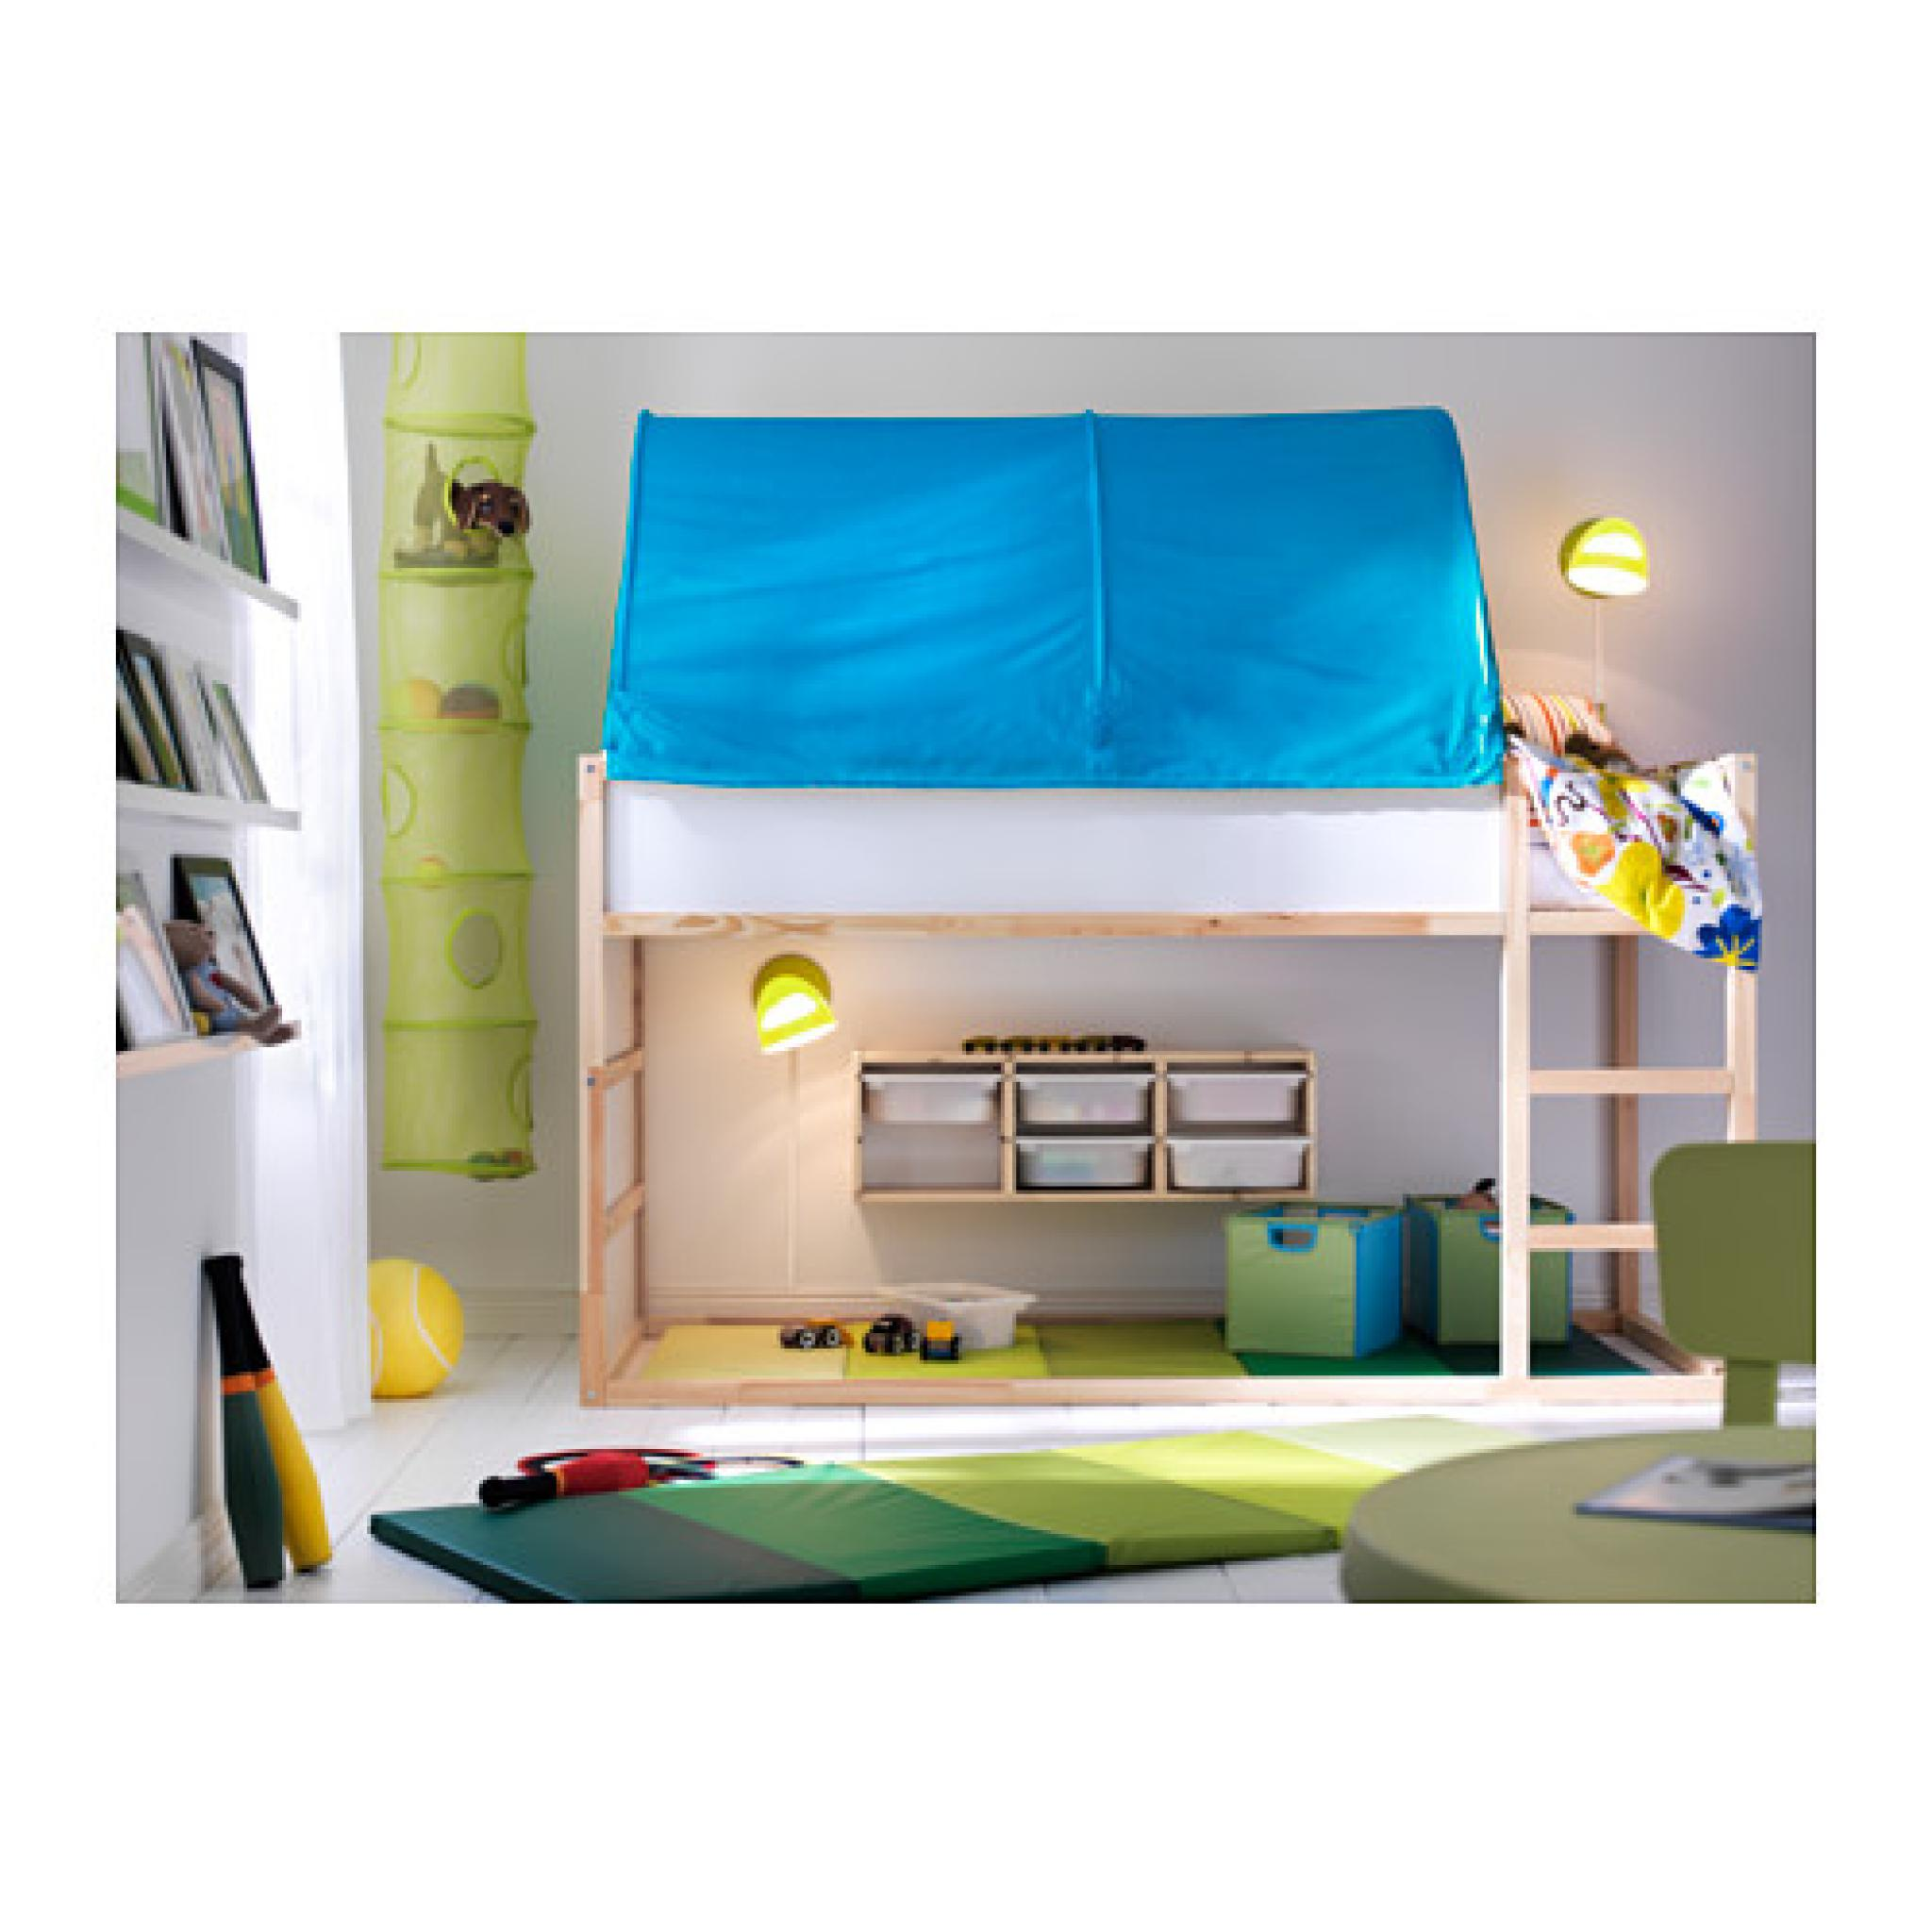 baldach n kura produkty. Black Bedroom Furniture Sets. Home Design Ideas